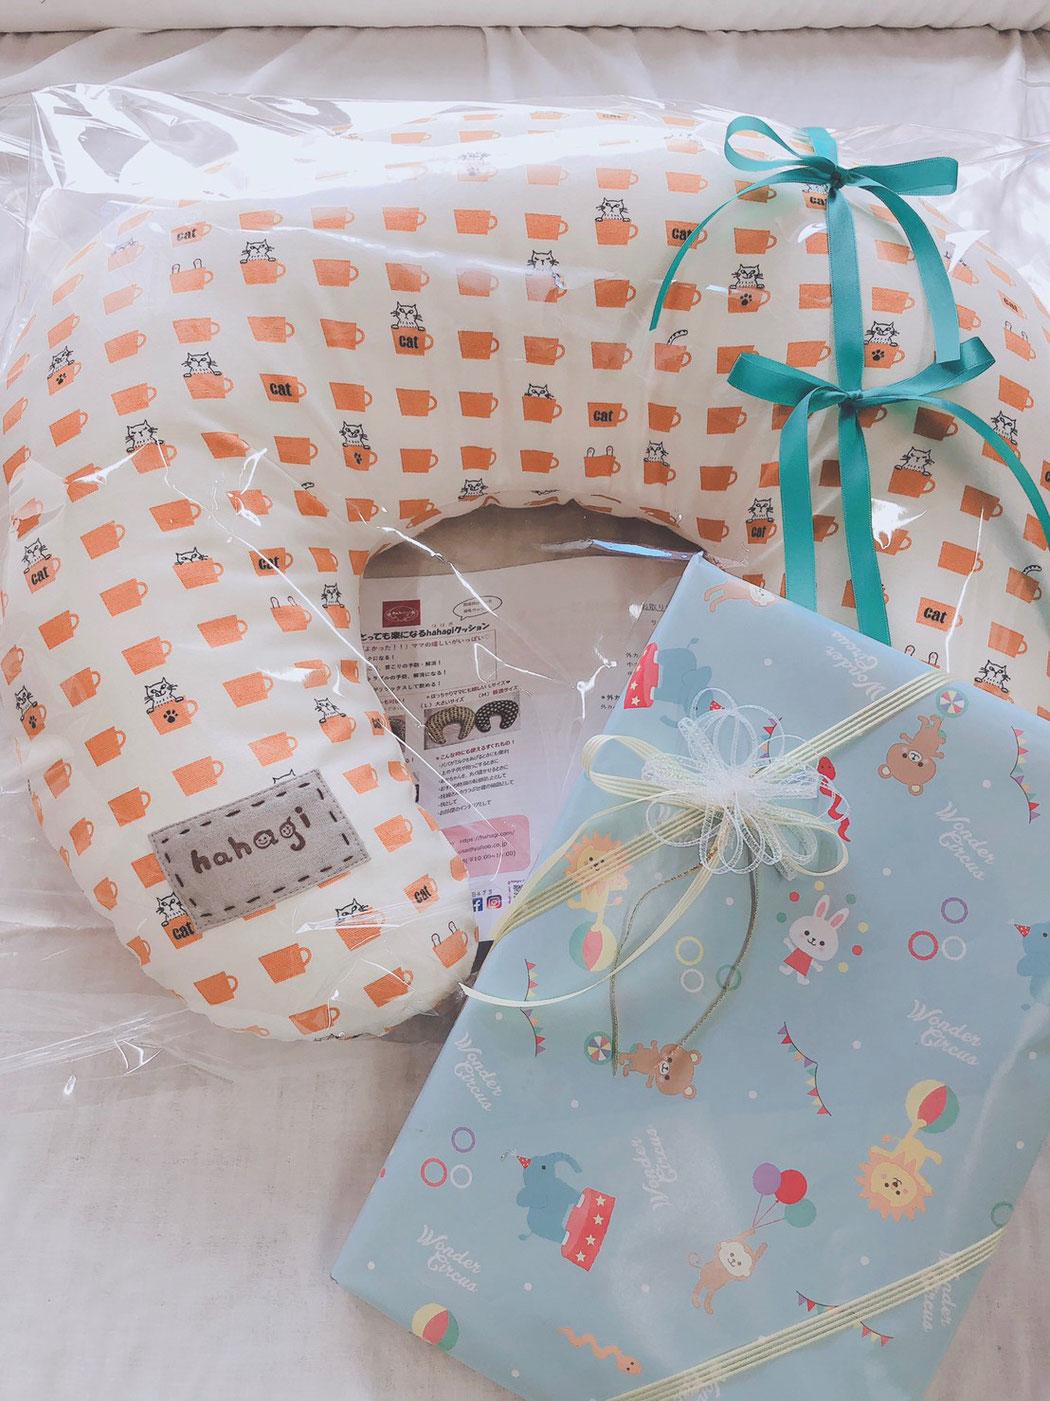 hahagi 授乳クッション お姉ちゃんからの出産祝い。